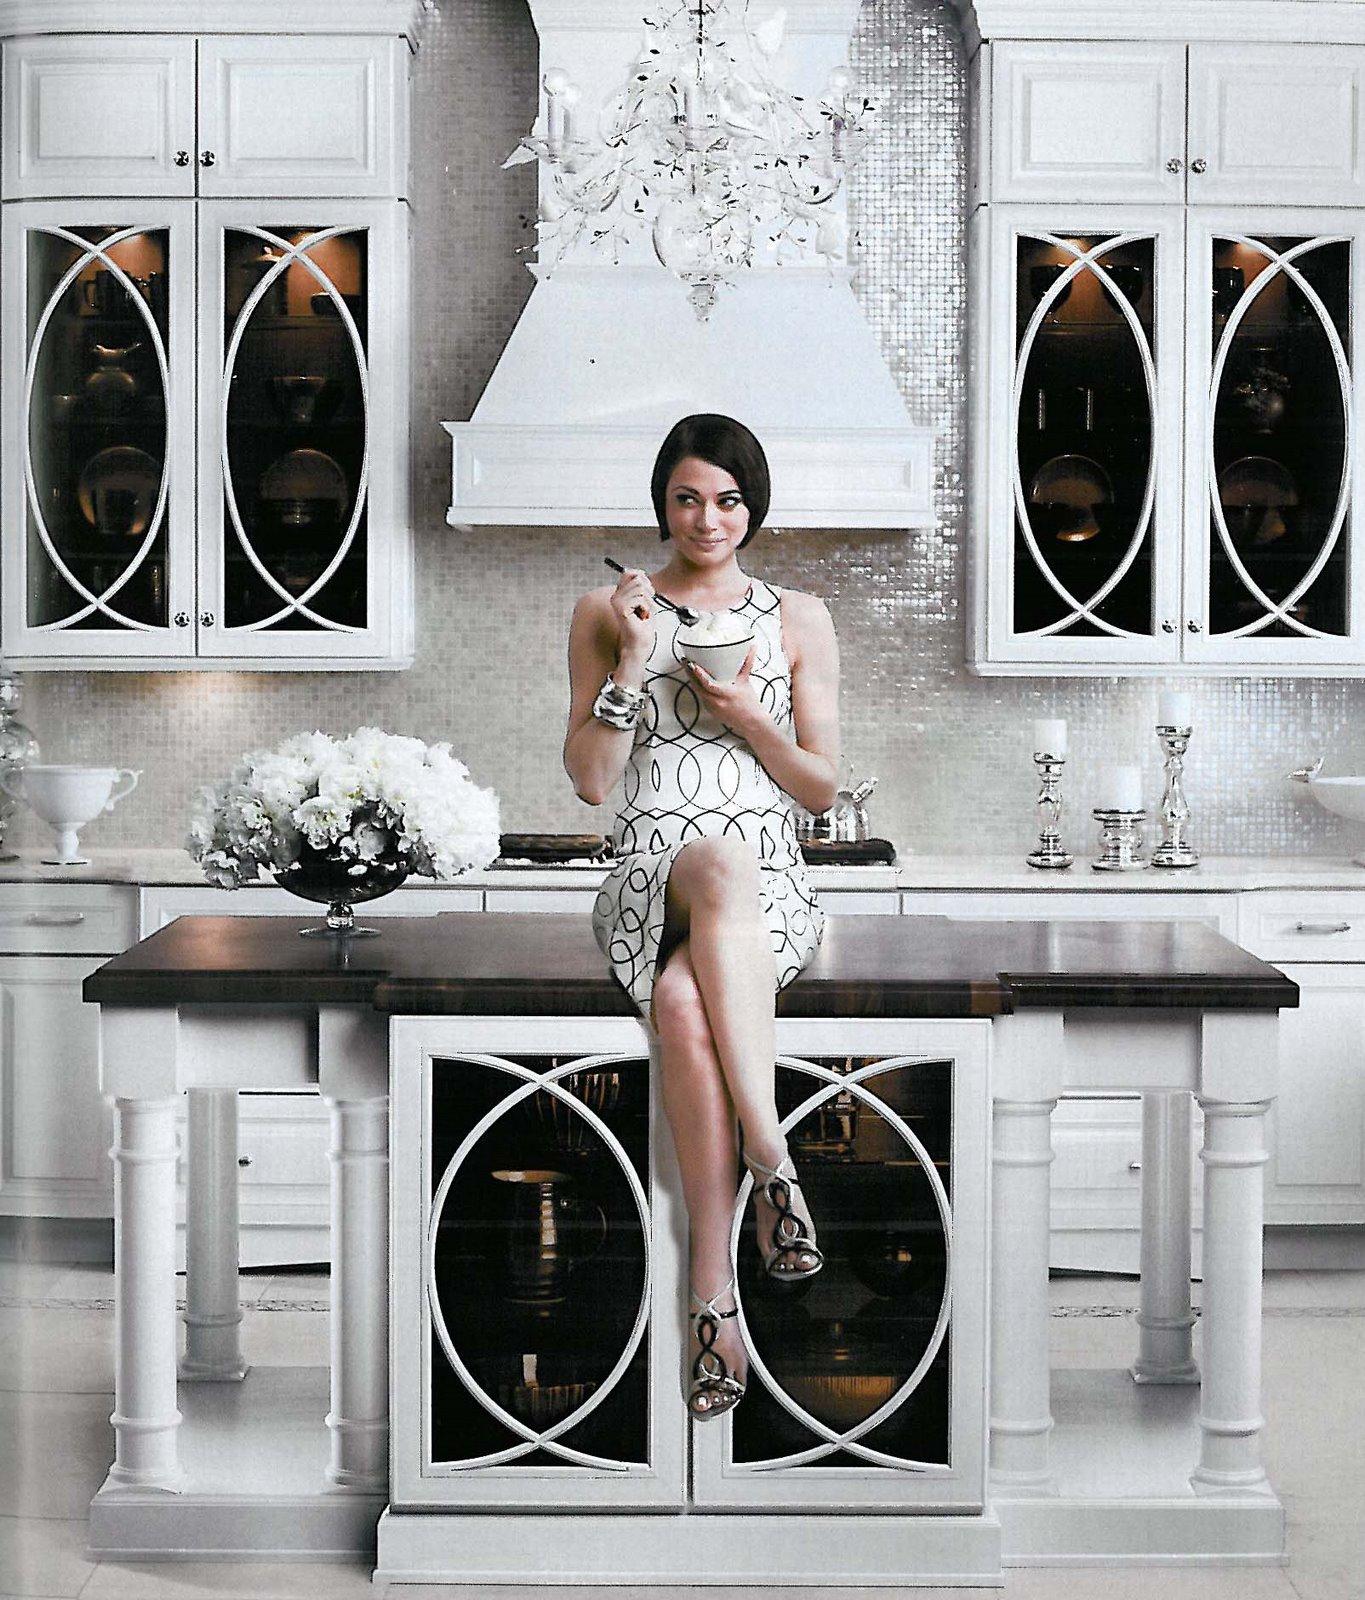 kraftmaid-vetro-neutra-bianco-lux-glass-tile.jpg